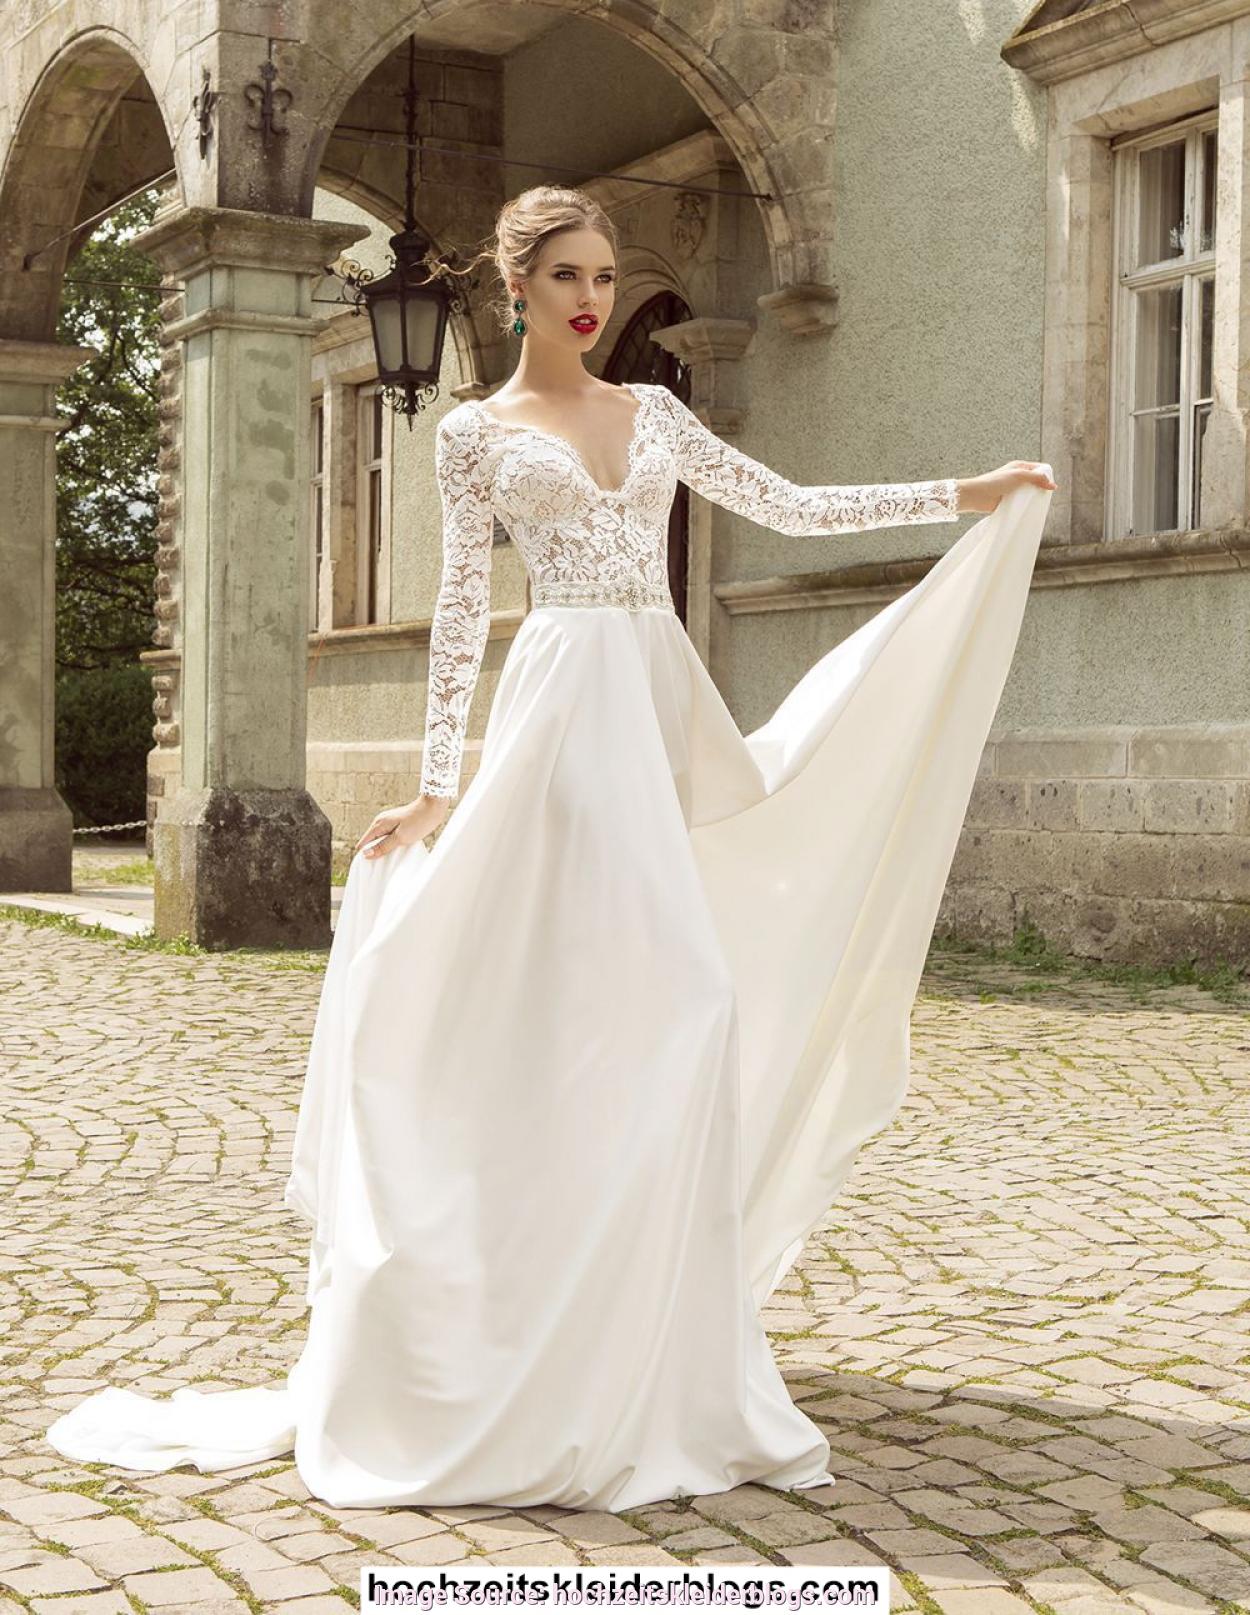 affordable wedding dresses near me photo - 1